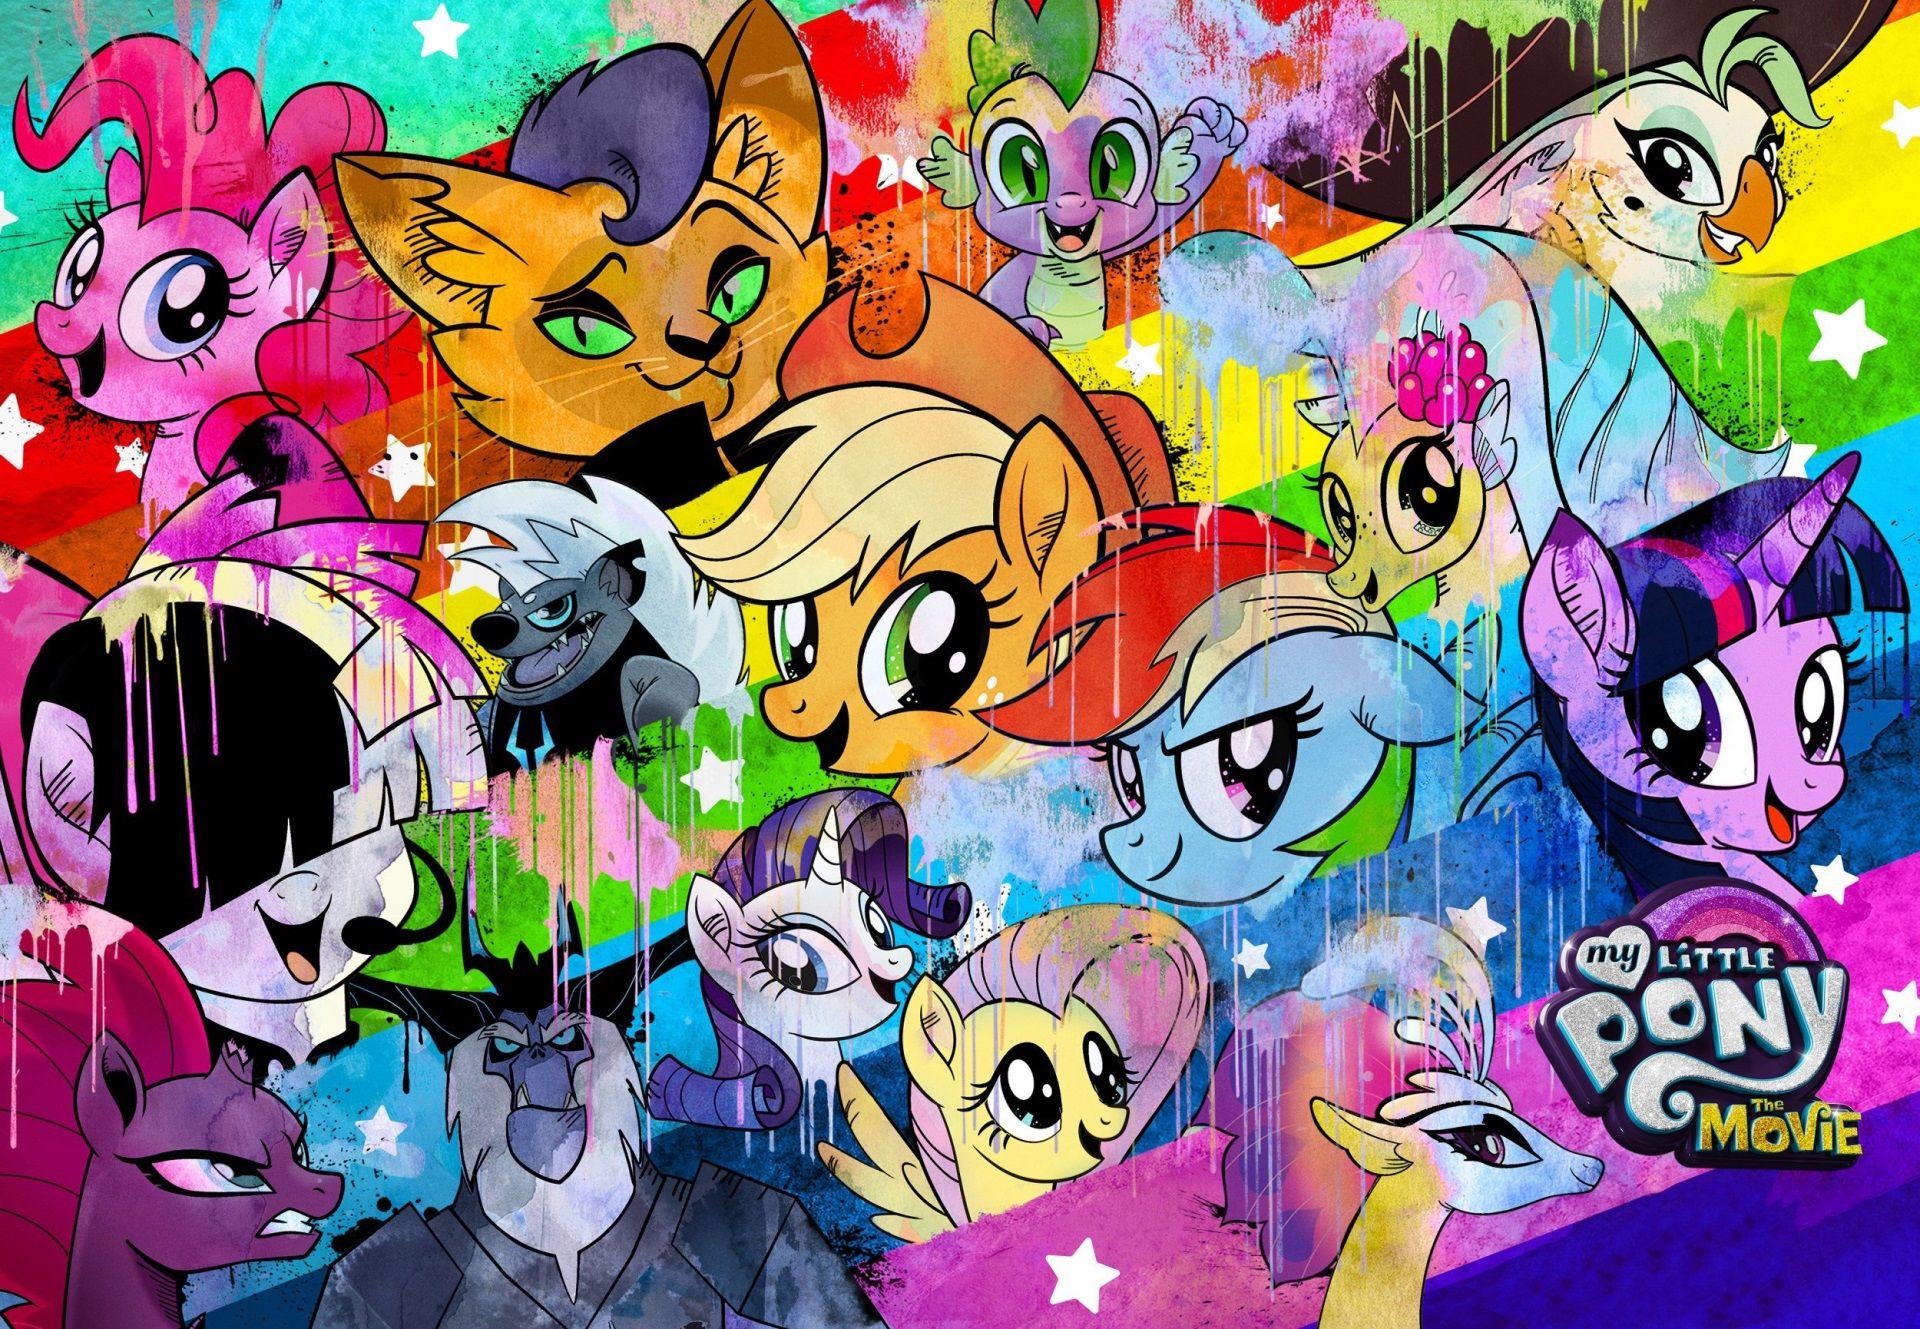 1920x1329 My Little Pony The Movie Windows Wallpaper For Desktop